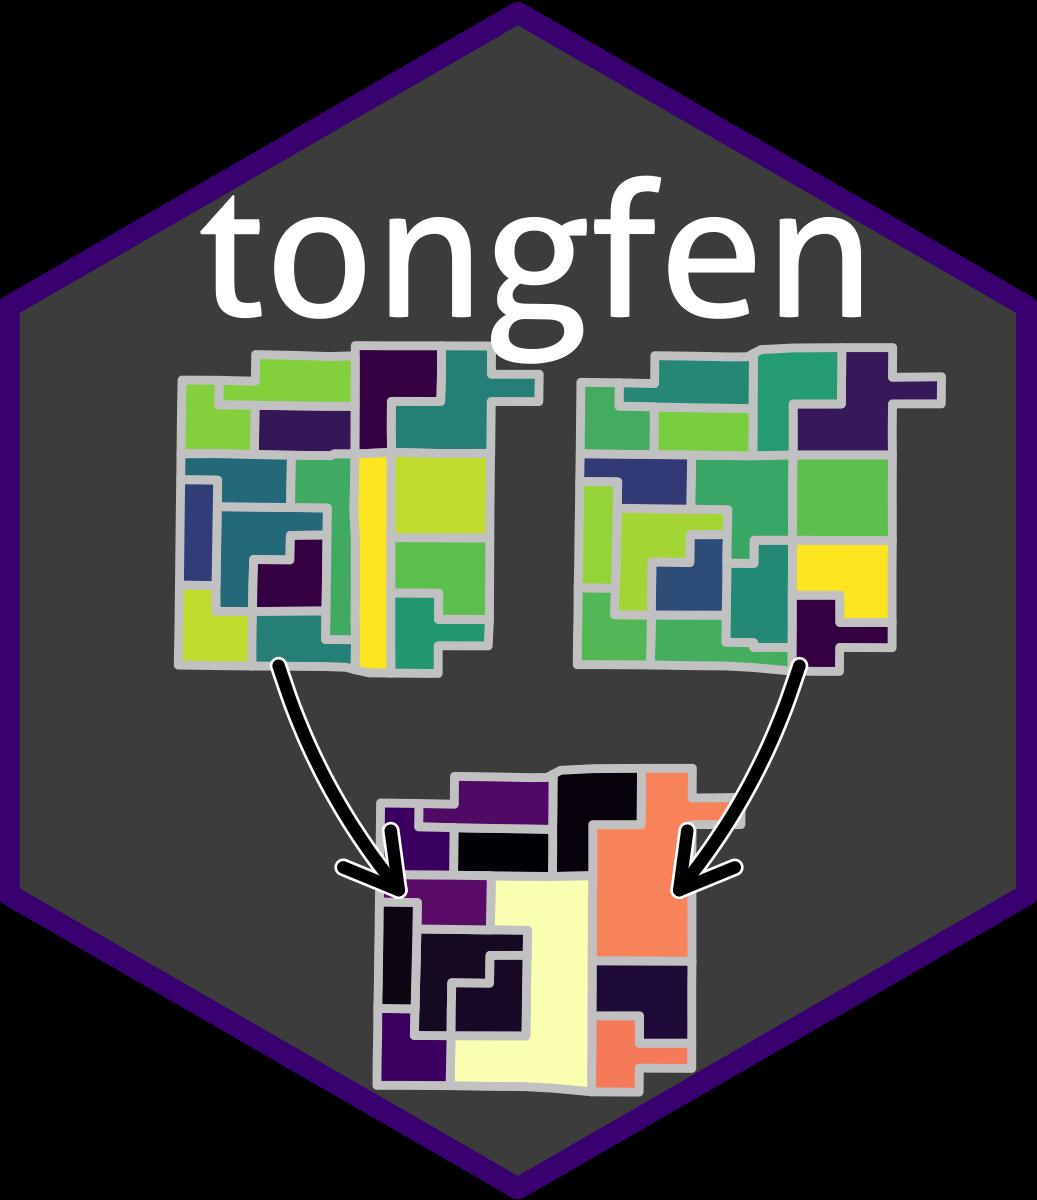 tongfen logo